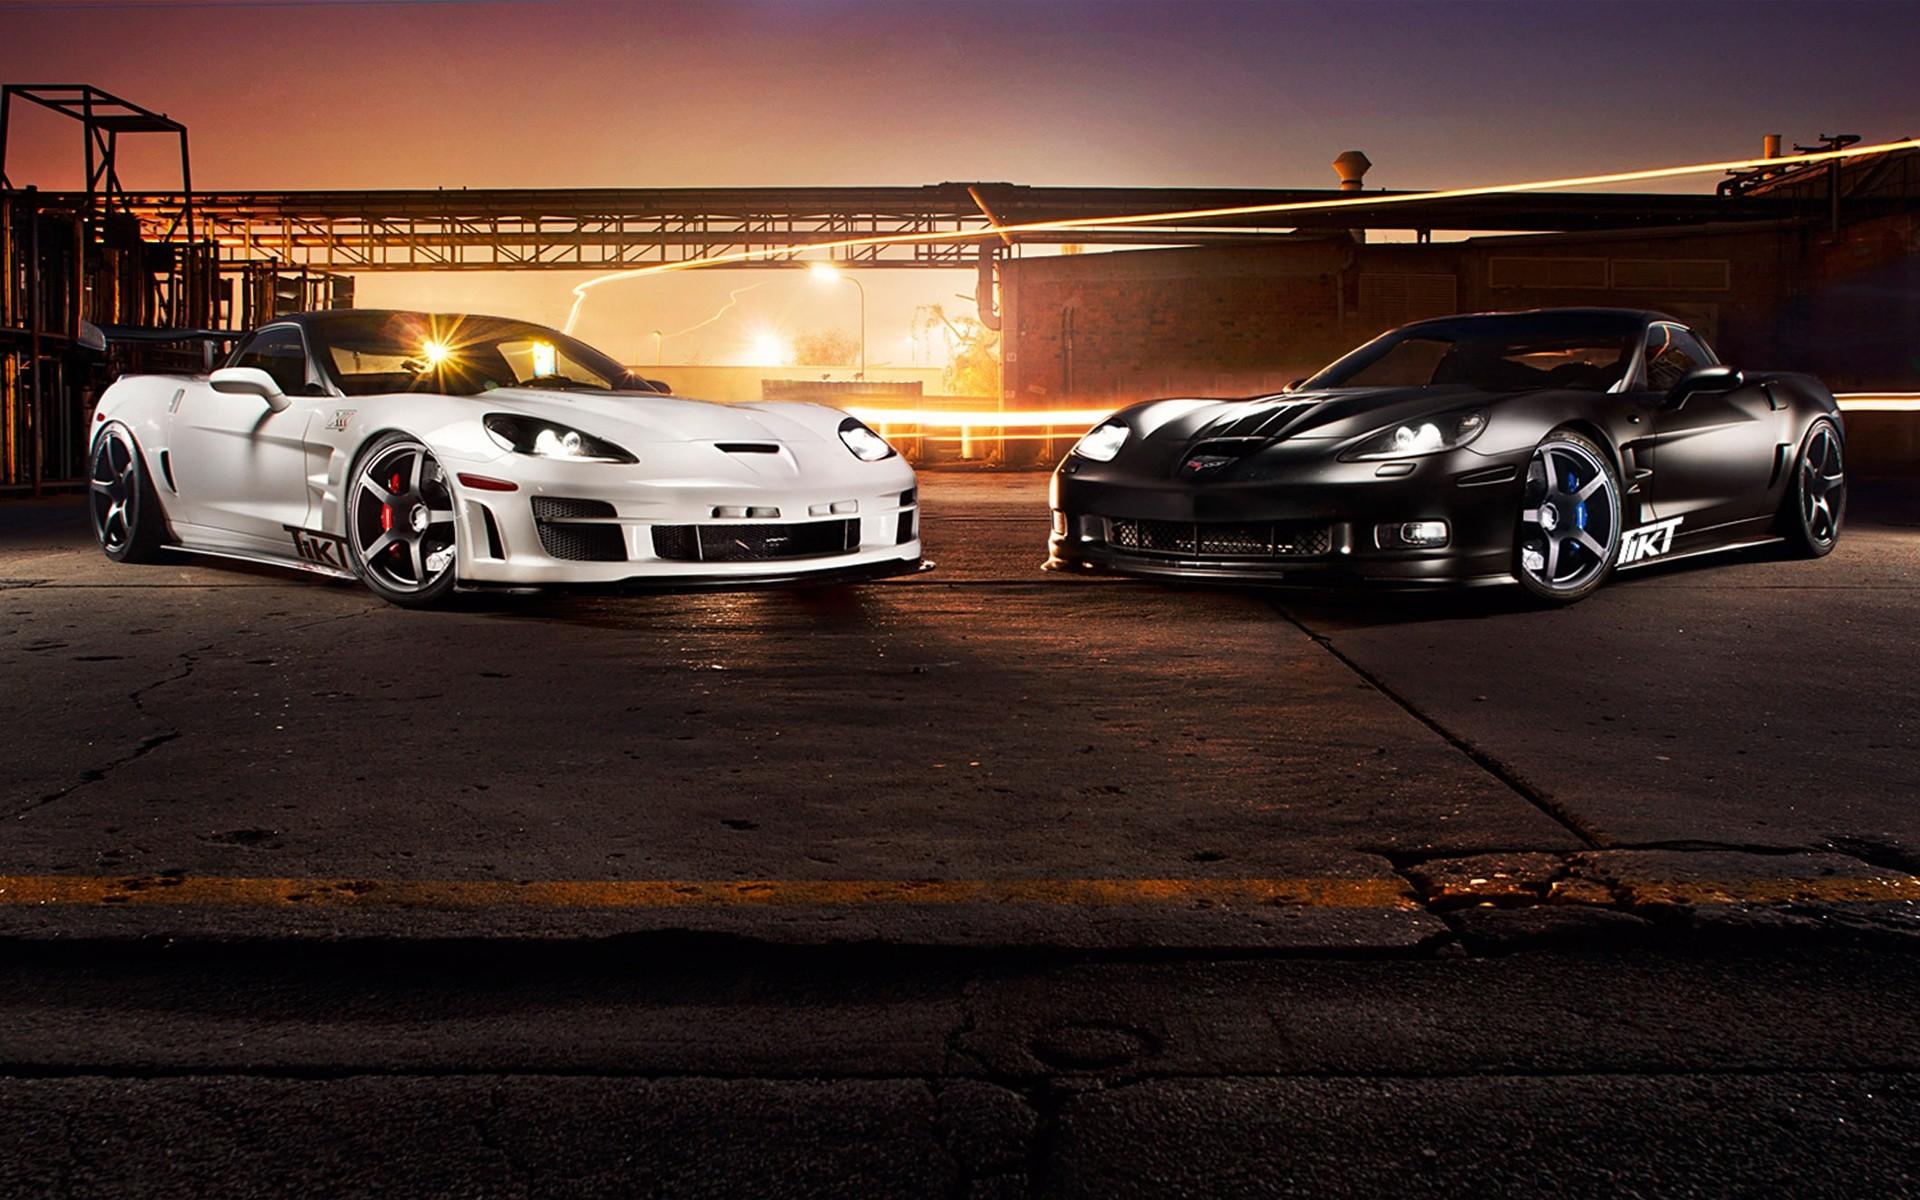 Fantastic Corvette Wallpaper